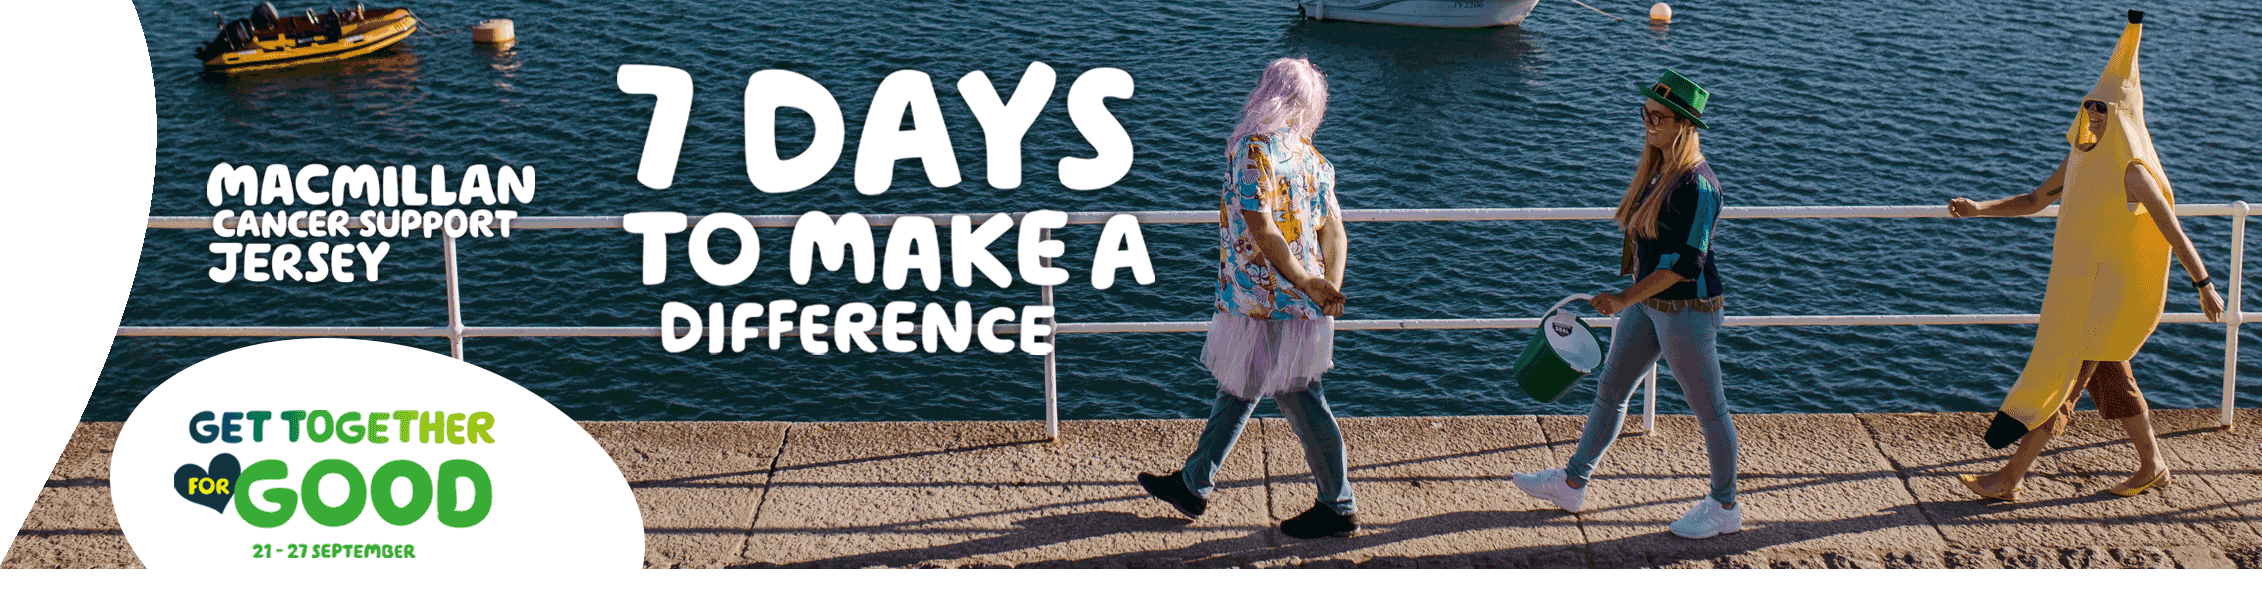 Macmillan Jersey - 7 days to make a difference